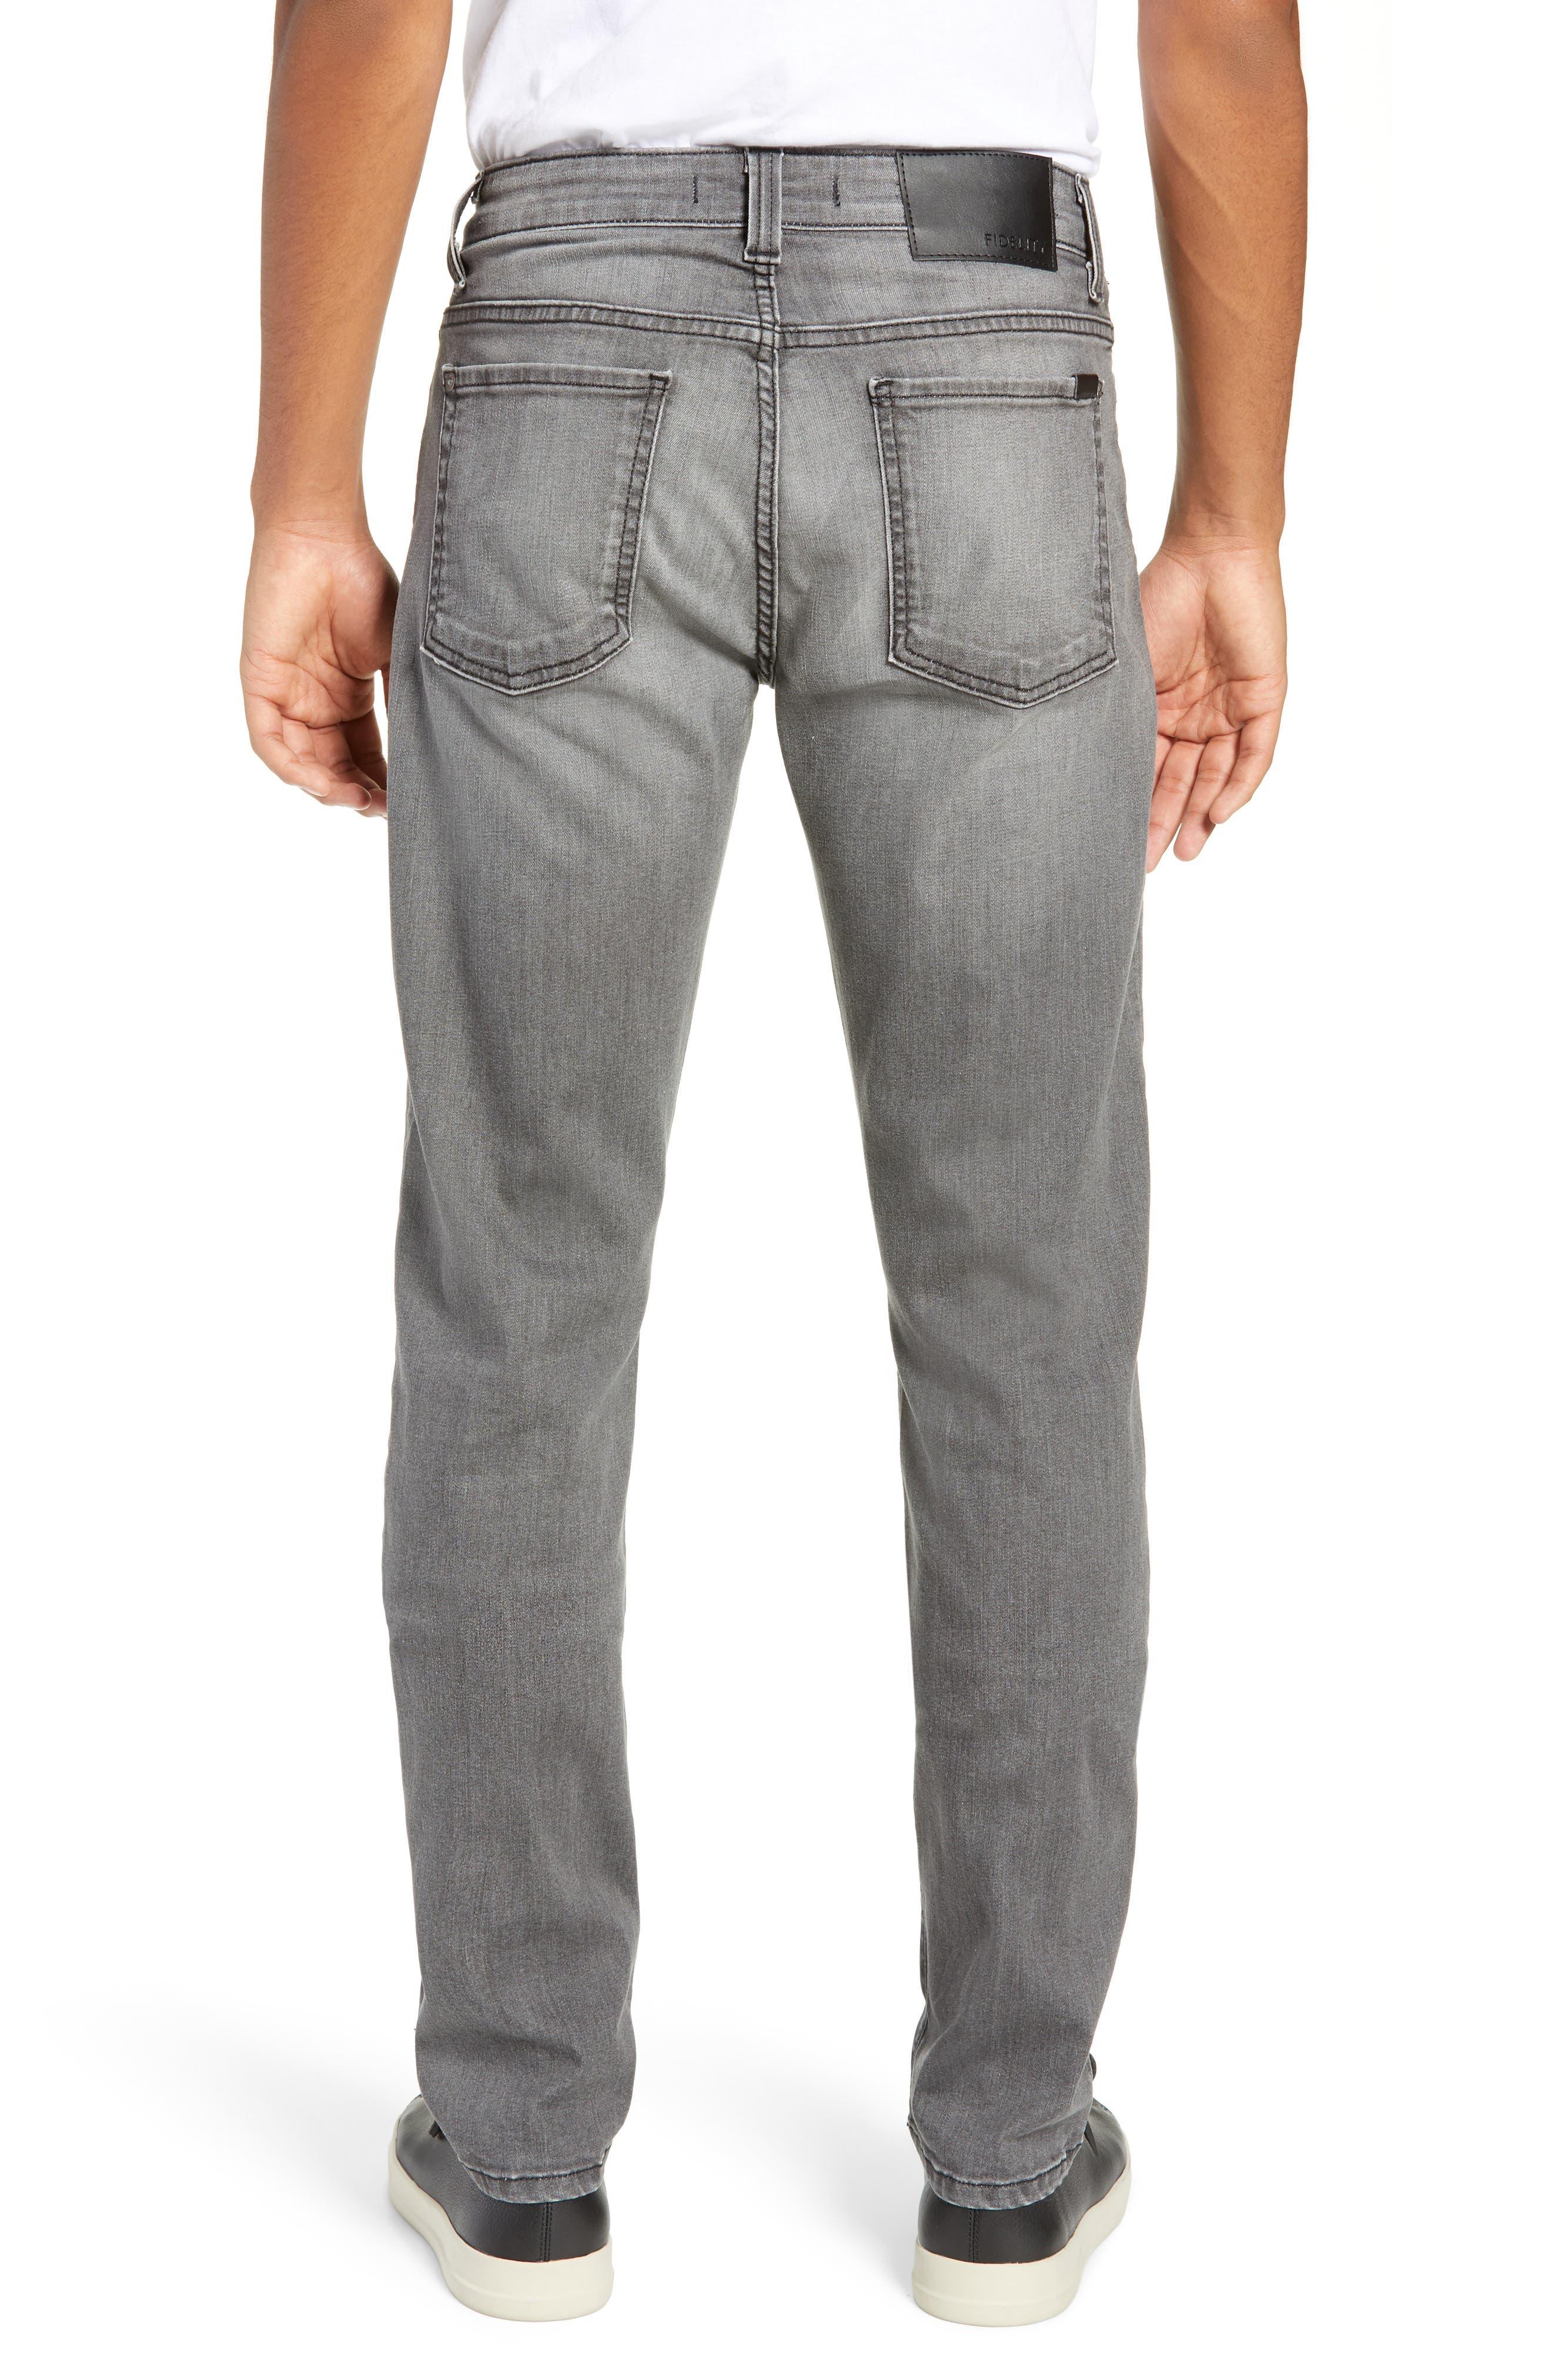 Torino Slim Fit Jeans,                             Alternate thumbnail 2, color,                             PHANTOM GREY